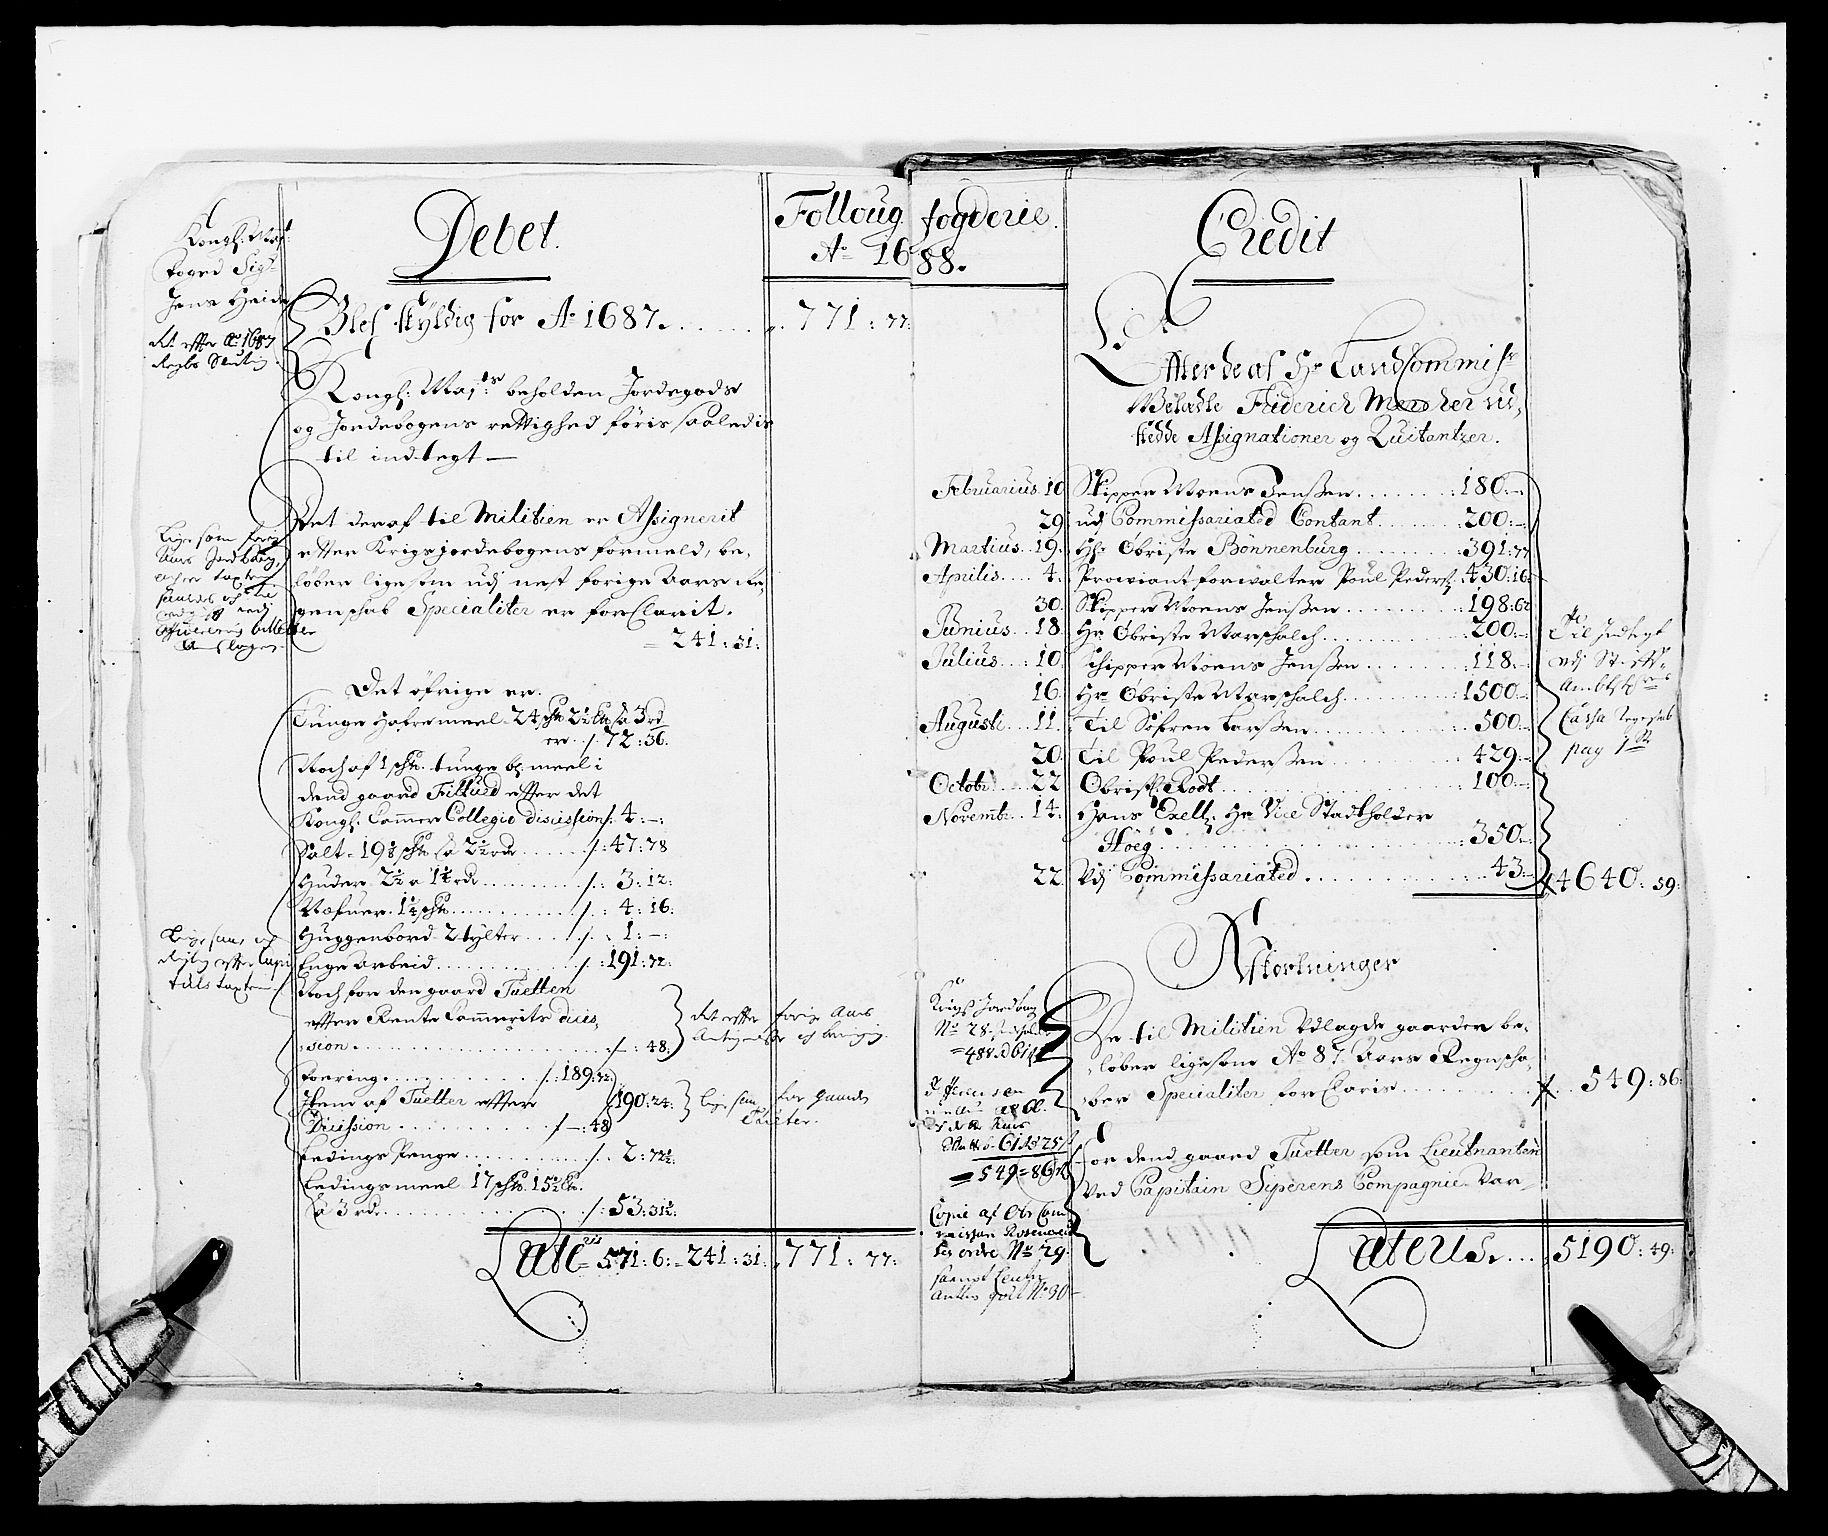 RA, Rentekammeret inntil 1814, Reviderte regnskaper, Fogderegnskap, R09/L0436: Fogderegnskap Follo, 1685-1691, s. 16